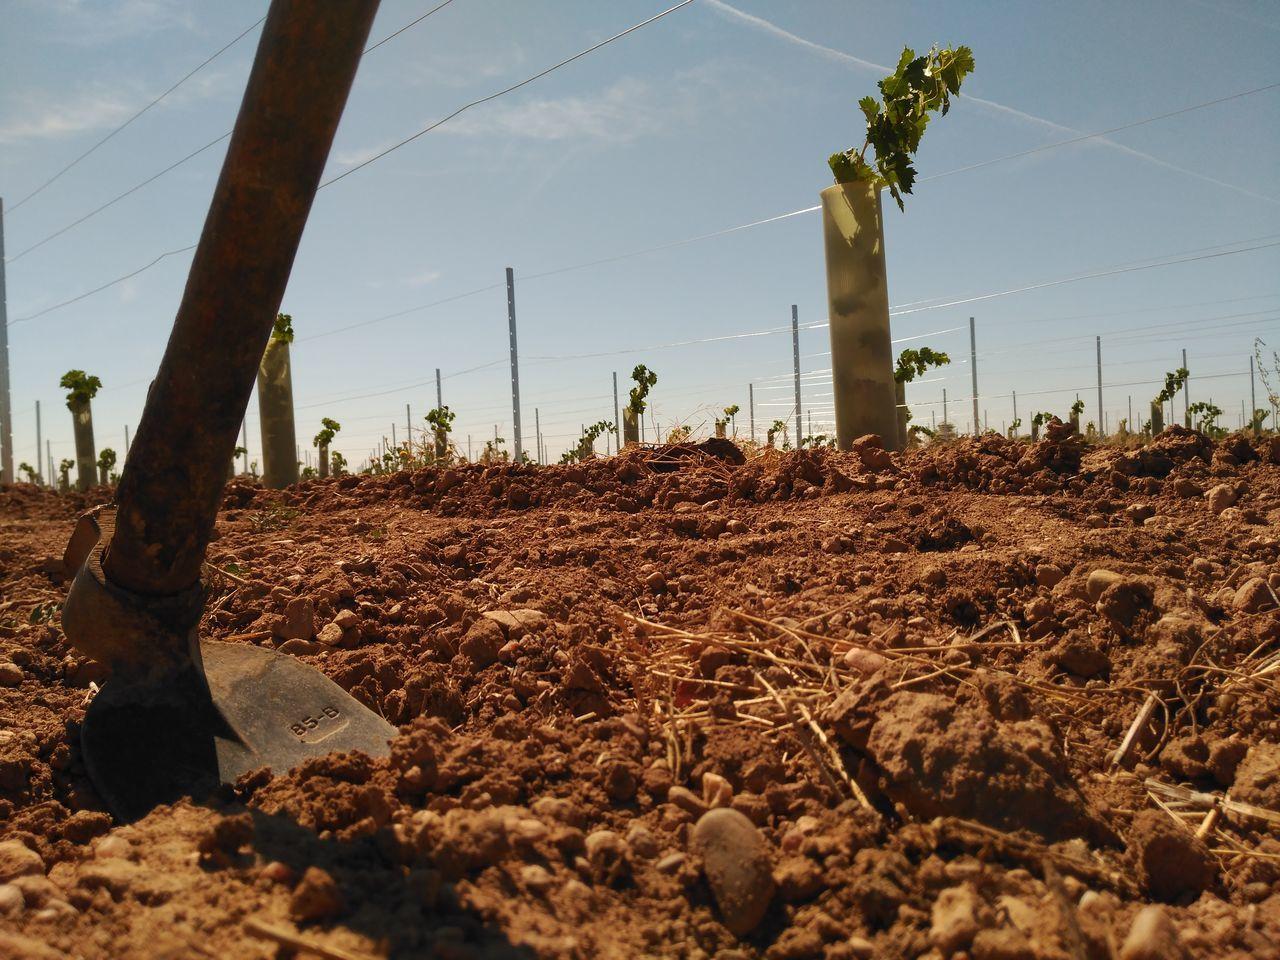 Wineyard Viña Hoe Countryside Campo CastillaLaMancha Without Filters